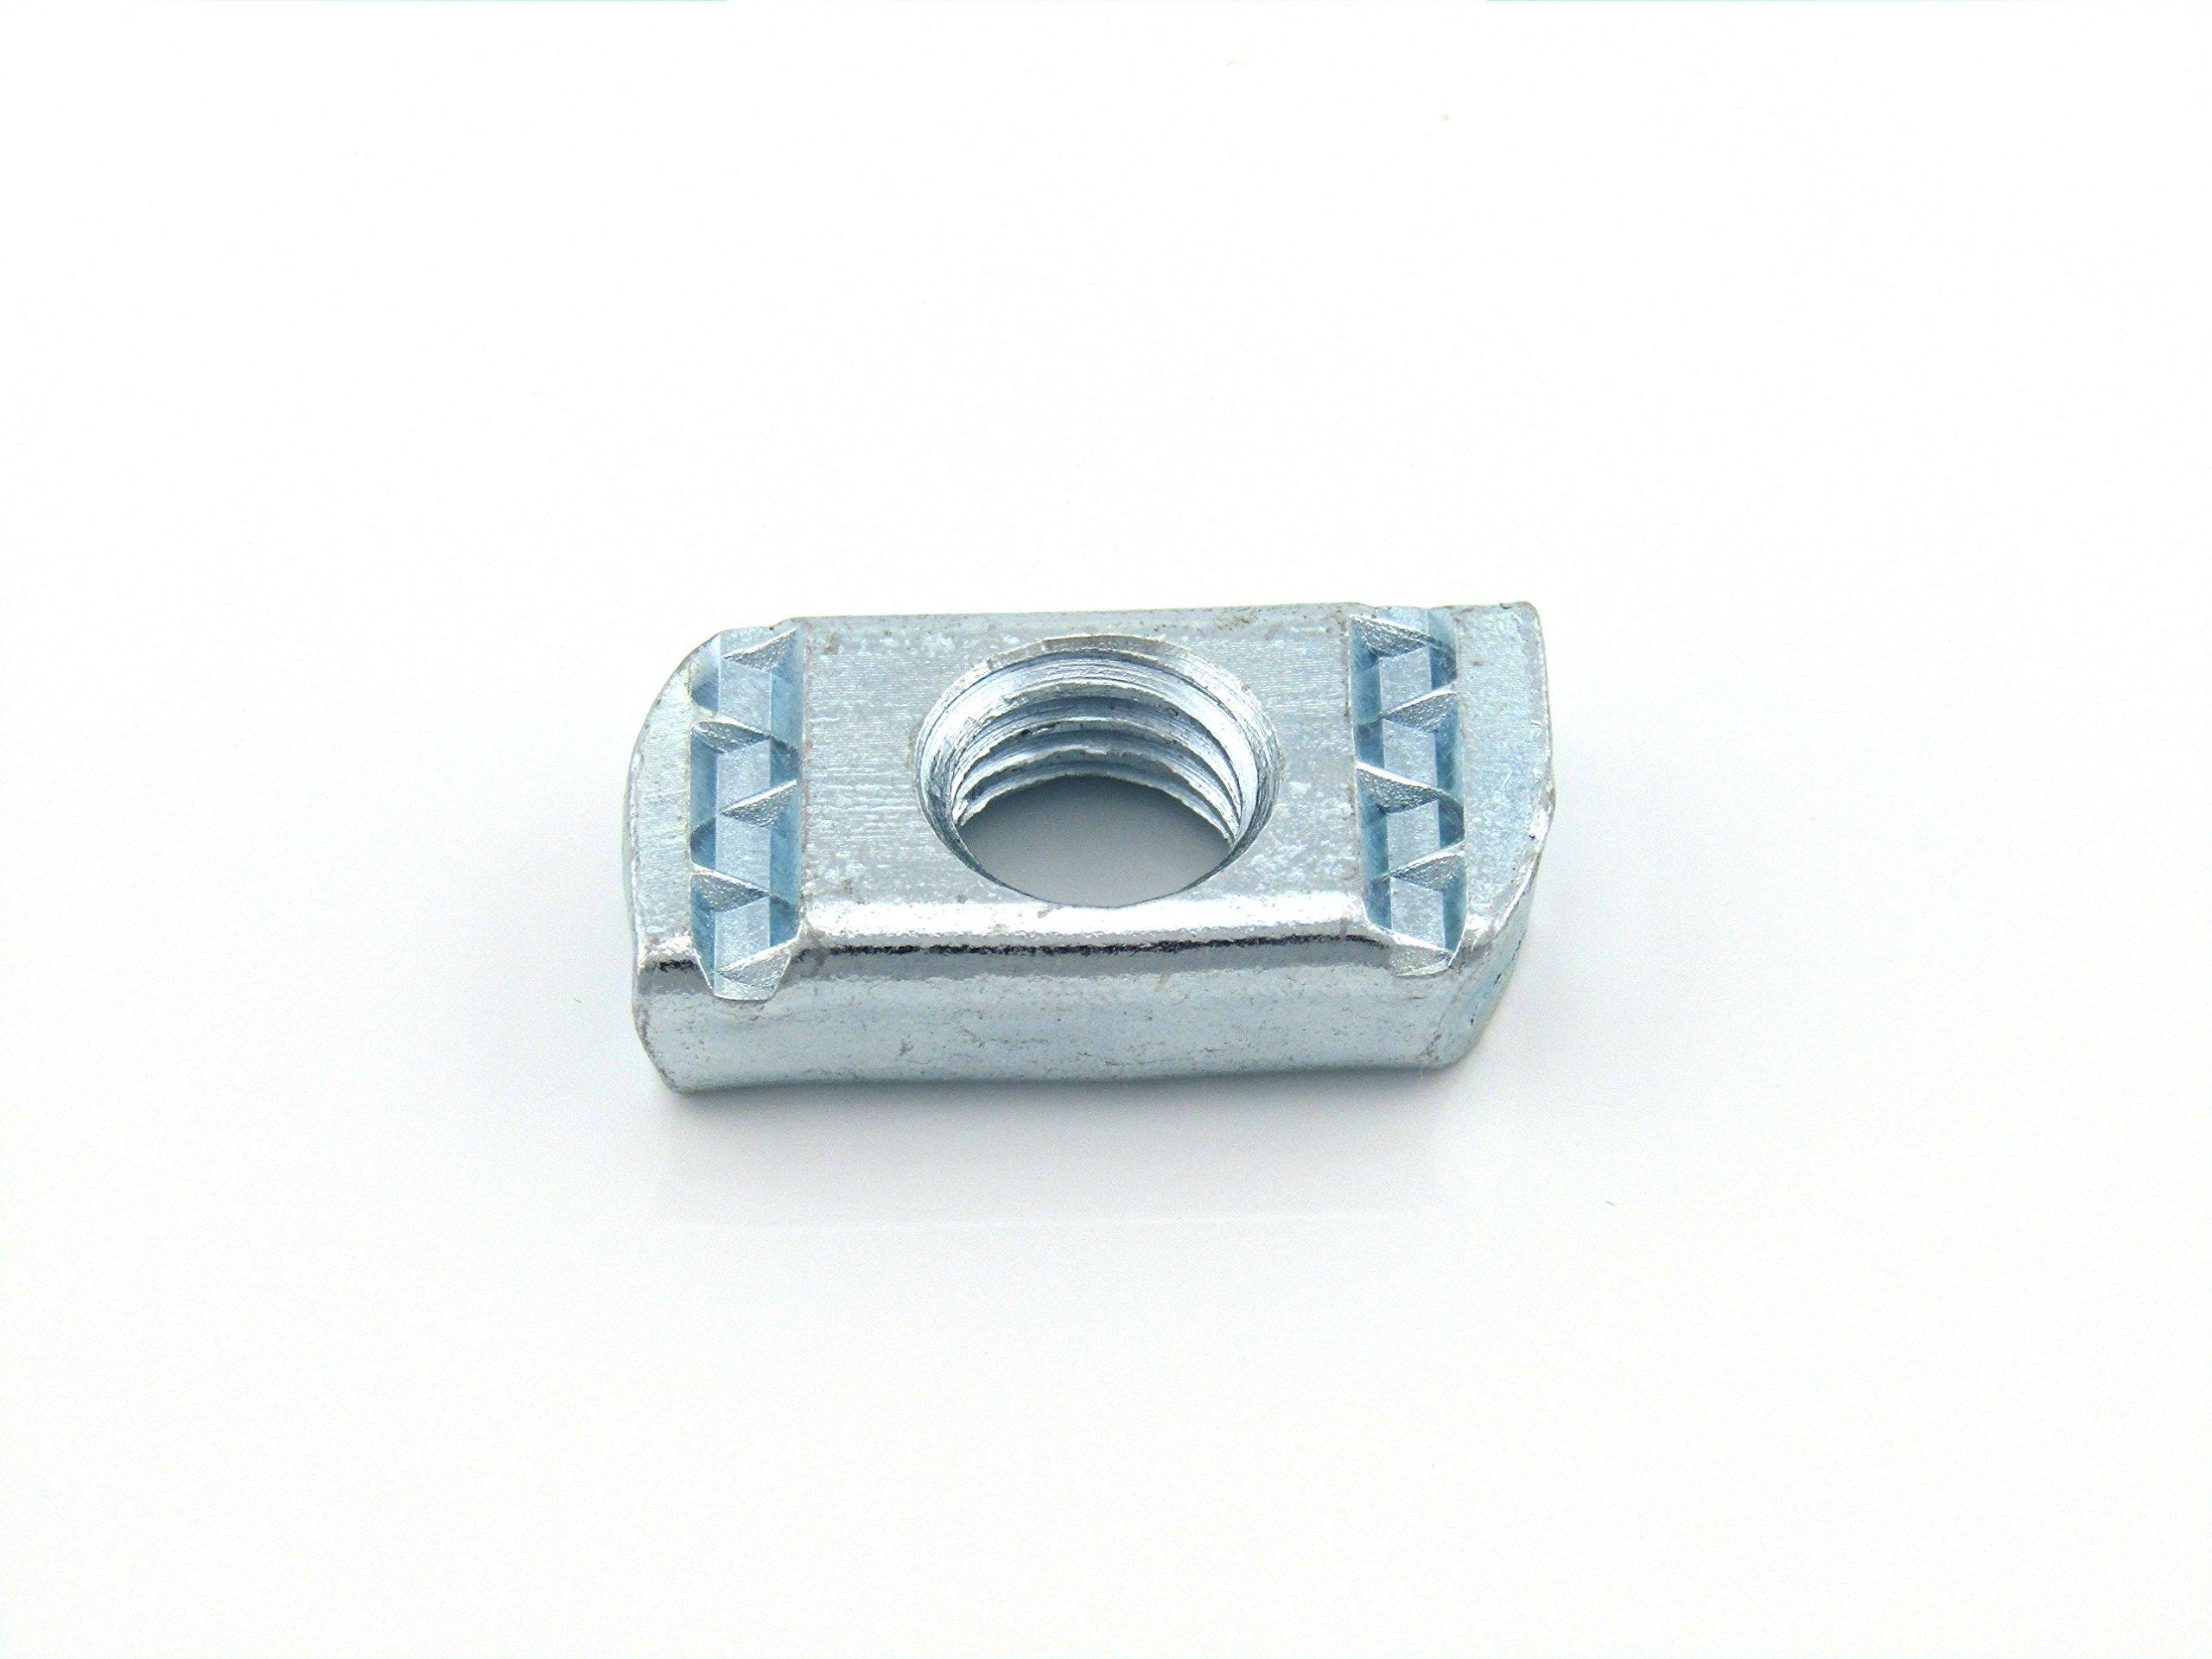 1/2-13X3/8 Thick, No Spring Nut (100 per box)